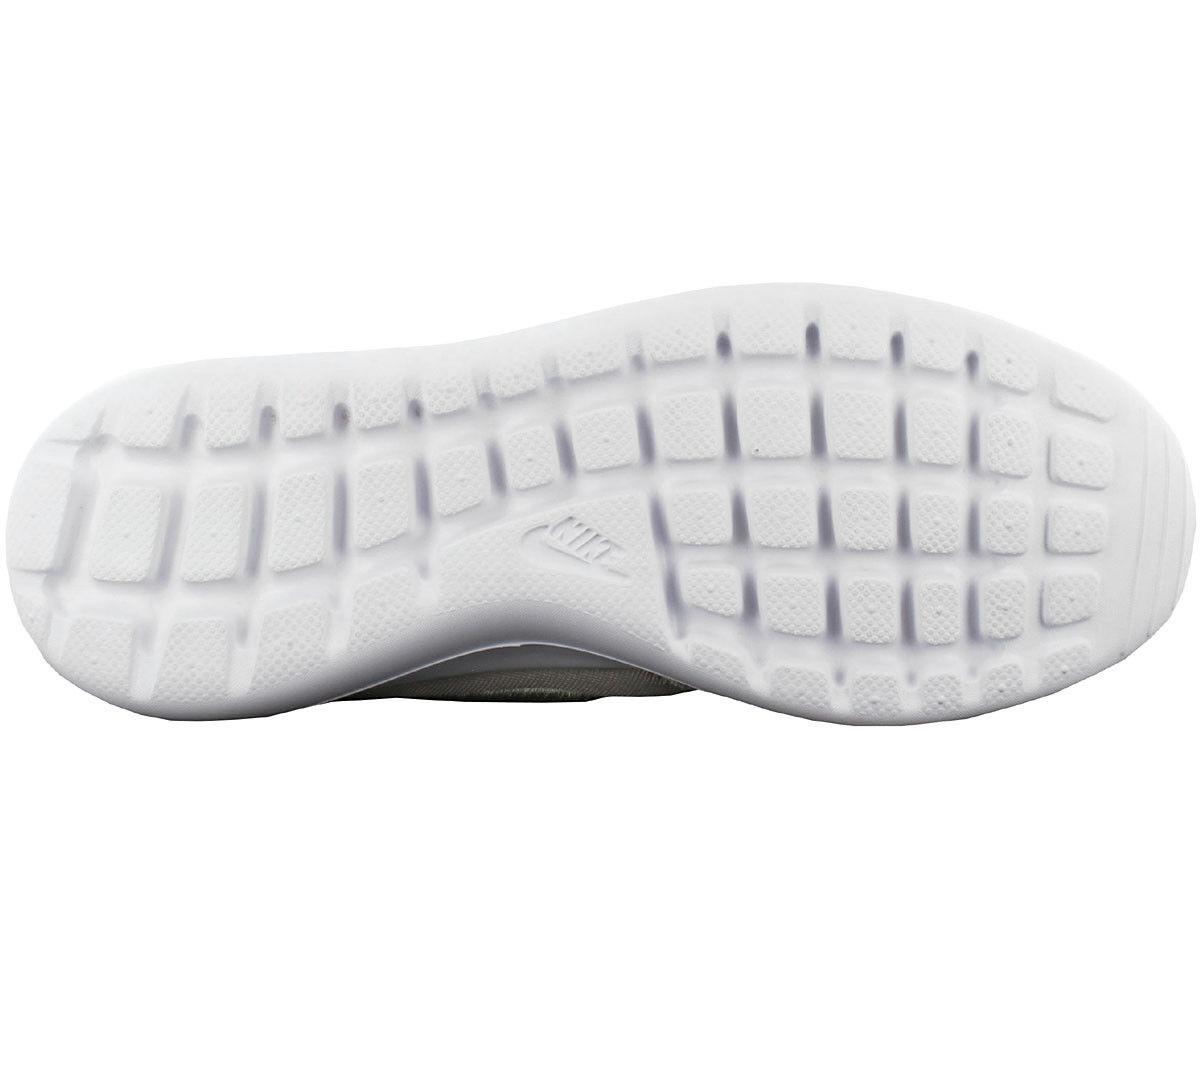 Nike Roshe Two BR Grau Breeze Damen Sneaker Schuhe Grau BR 896445-002 One Turnschuhe NEU 74a2a6